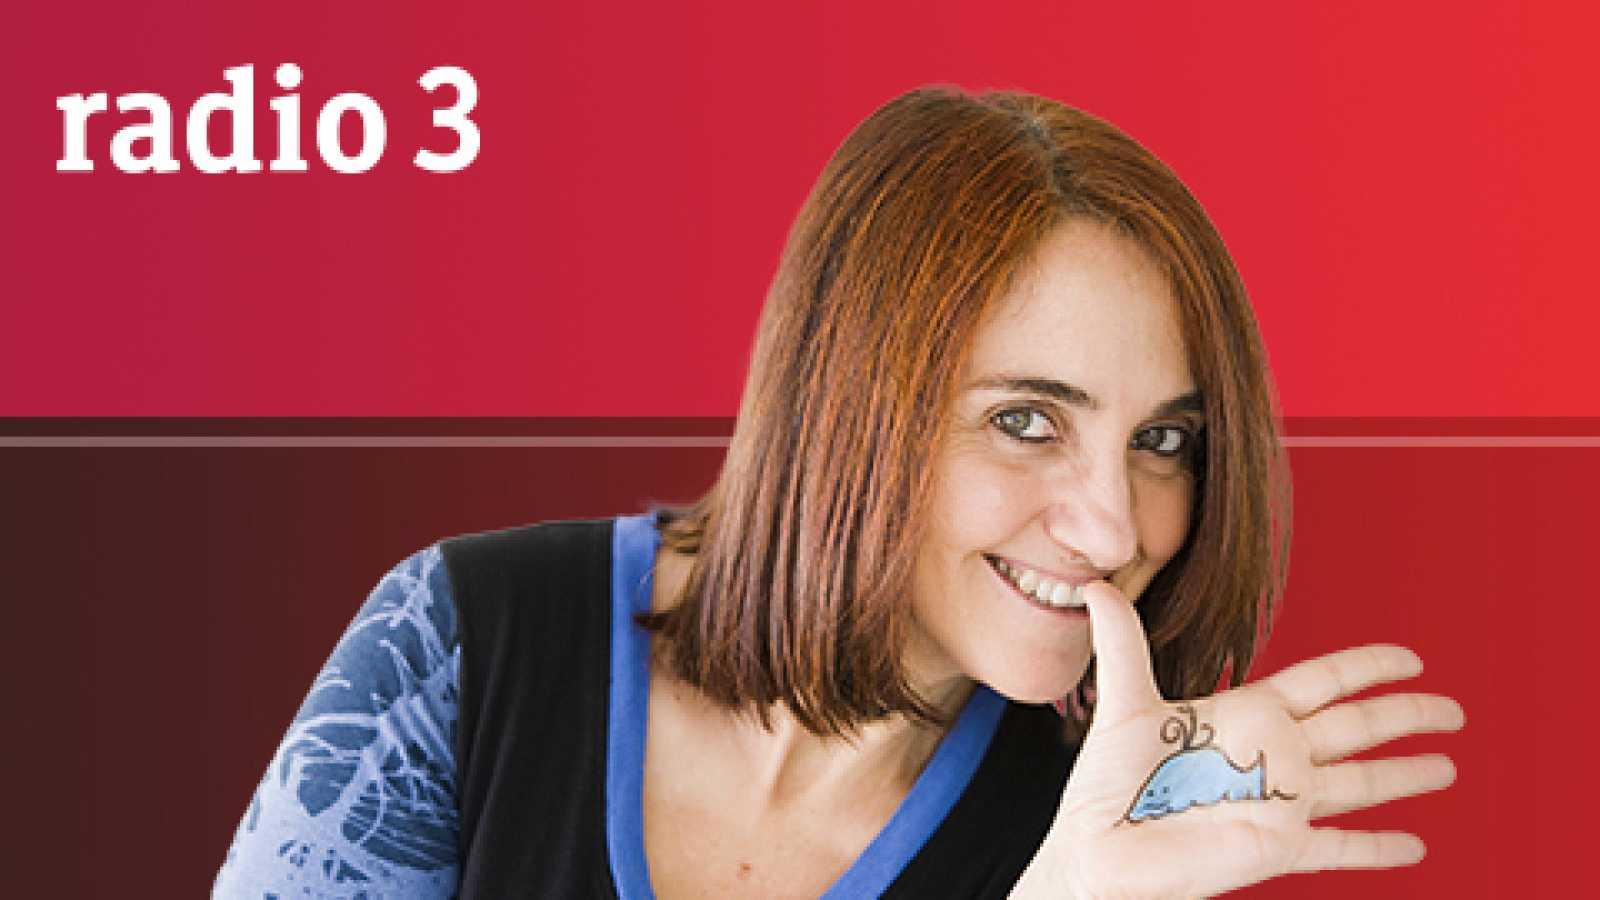 Mediterráneo - Bobo Rondelli. A Famous Local Singer - 09/02/14 - escuchar ahora